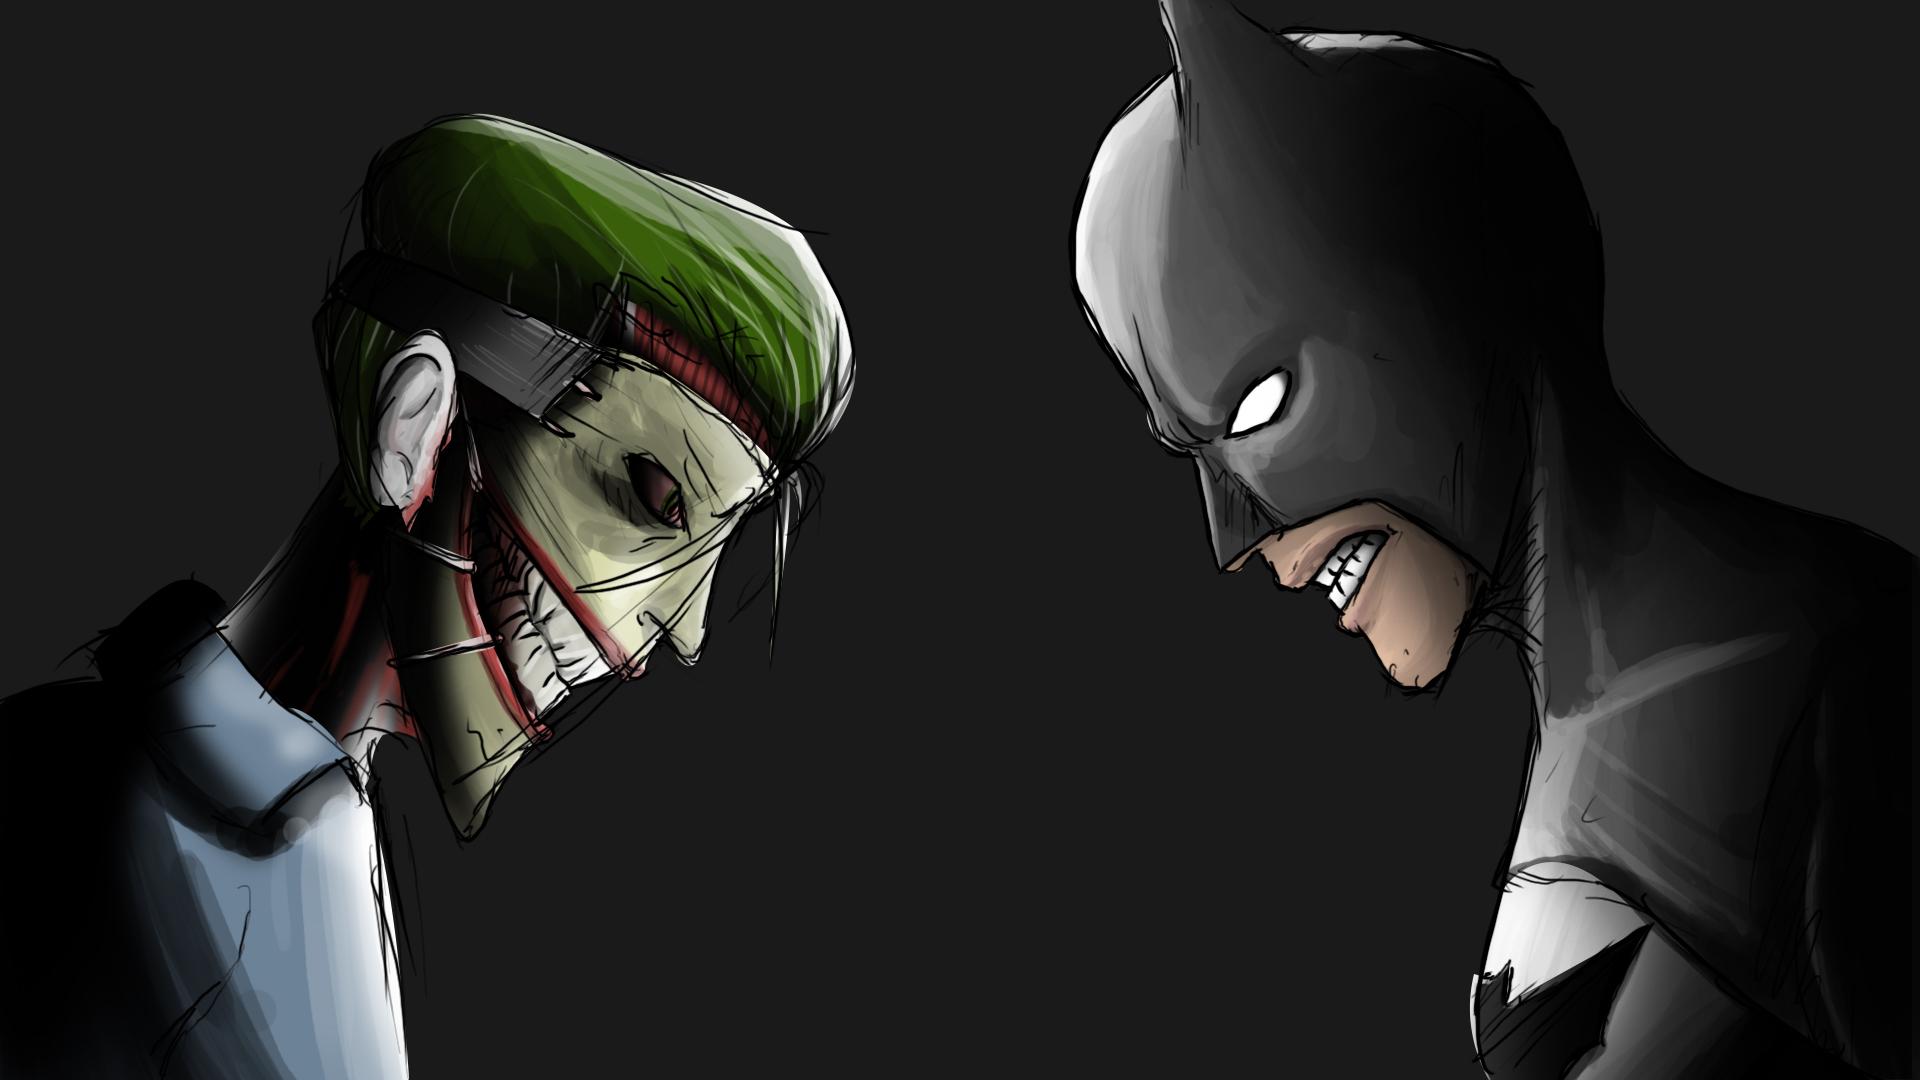 Bats V. Joke